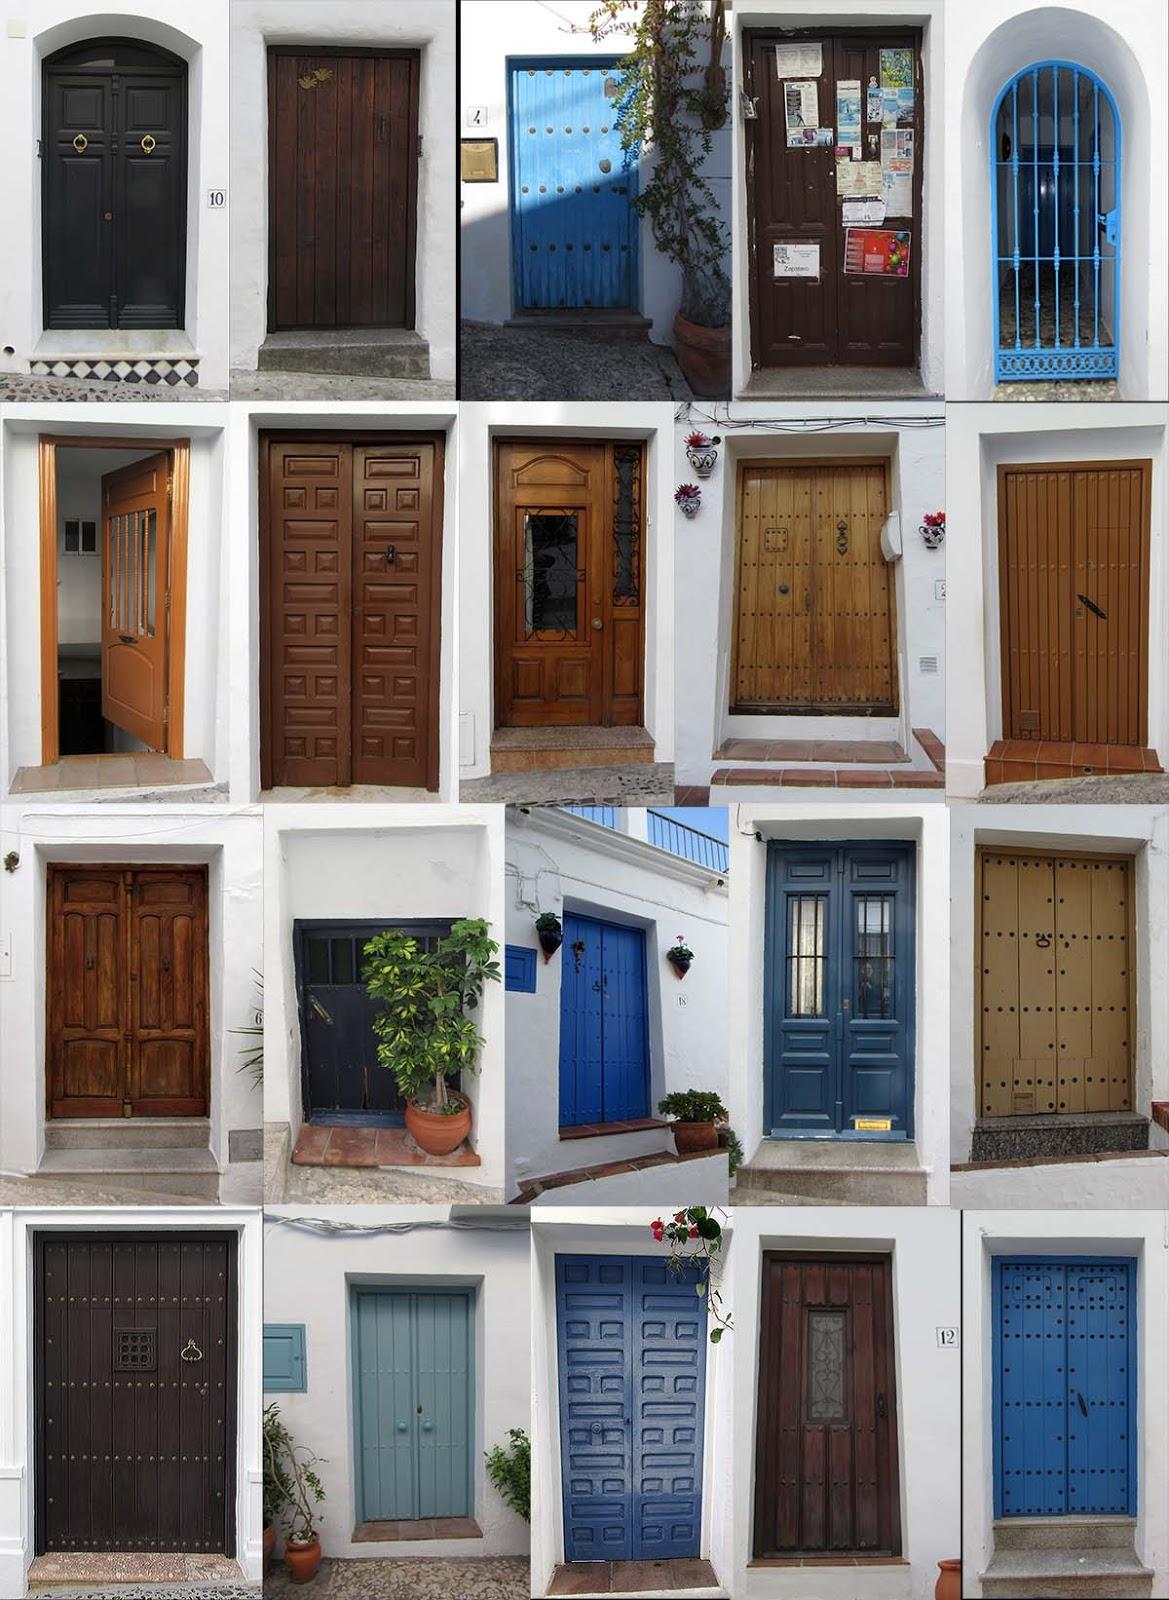 The [Moorish] Doors & Mitchell is Moving: The [Moorish] Doors pezcame.com